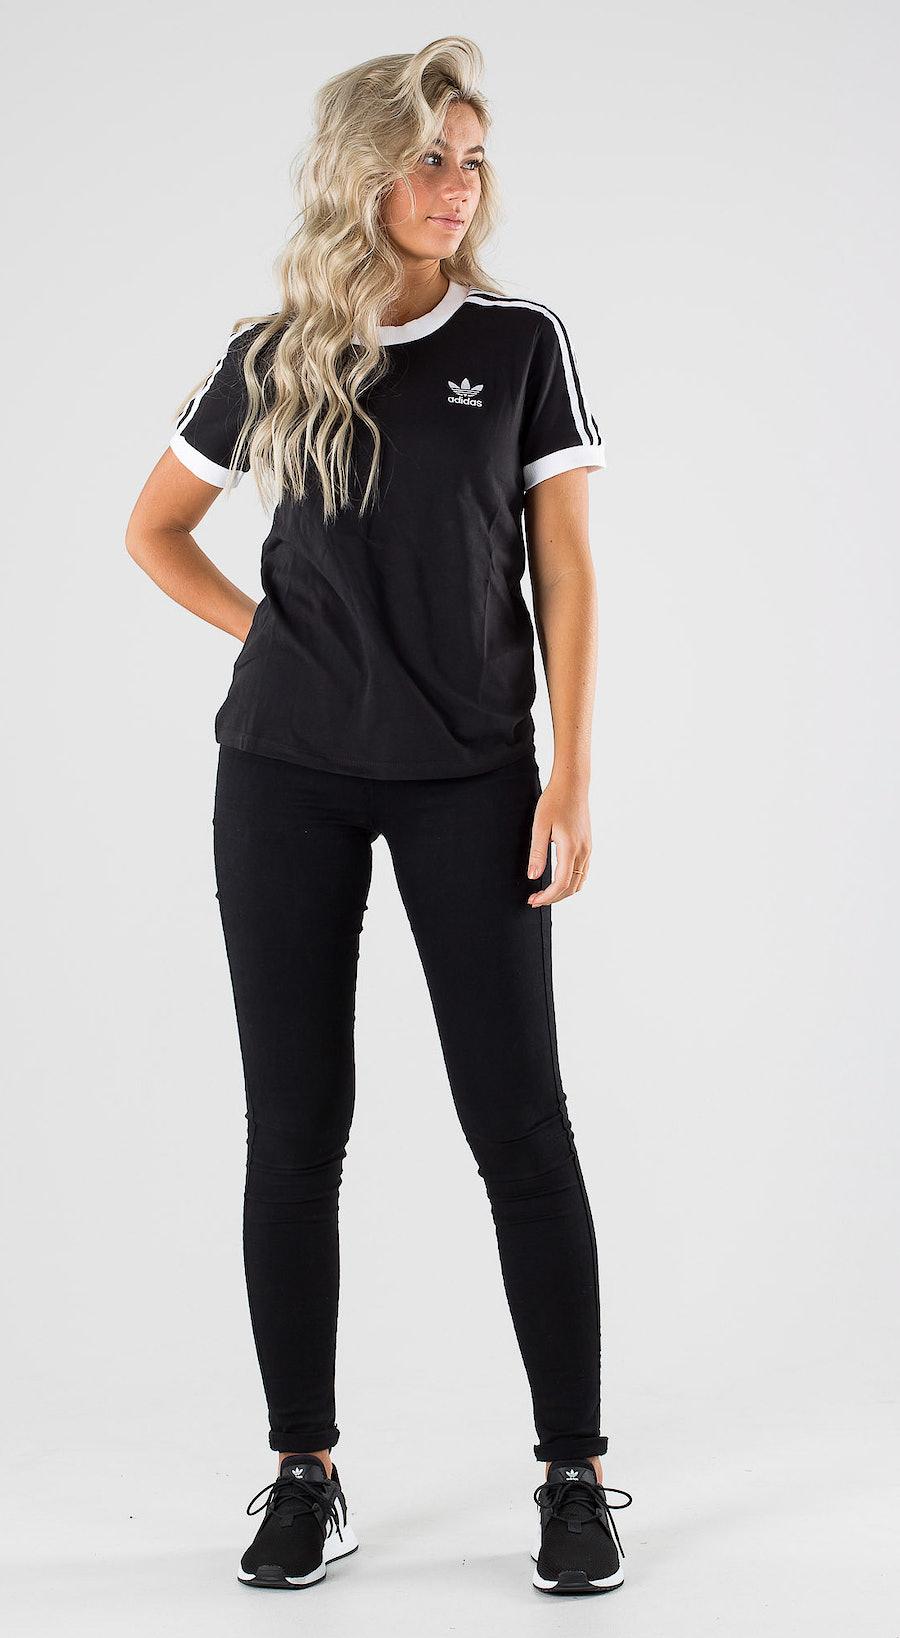 Adidas Originals 3 Stripe Tee Black Outfit Multi